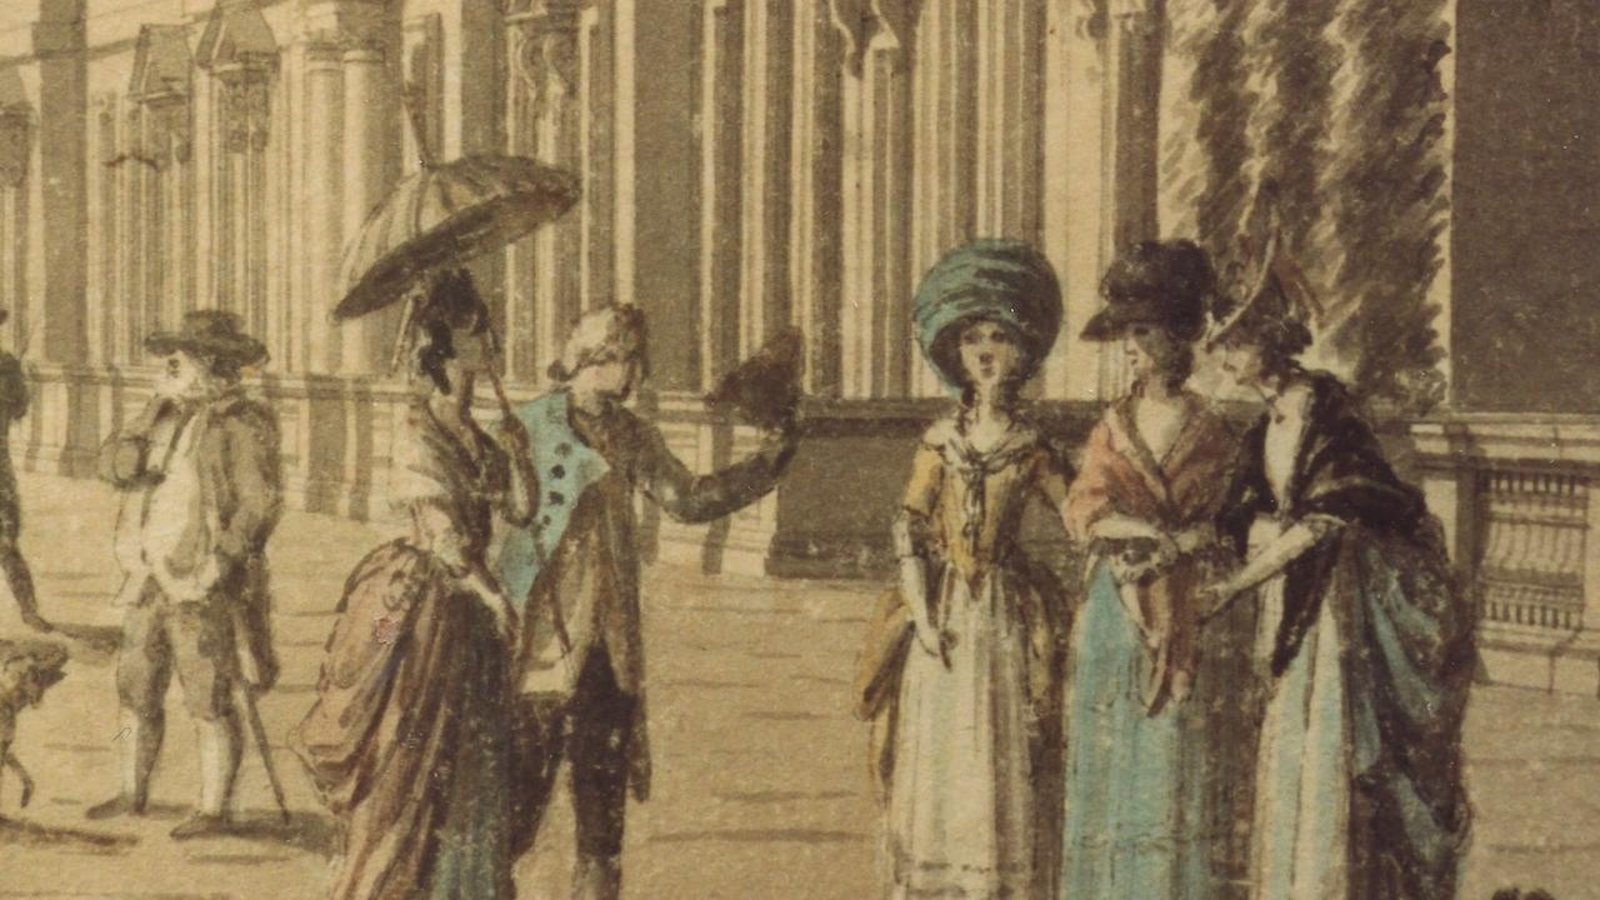 Austen - The Life and Work of Jane Austen